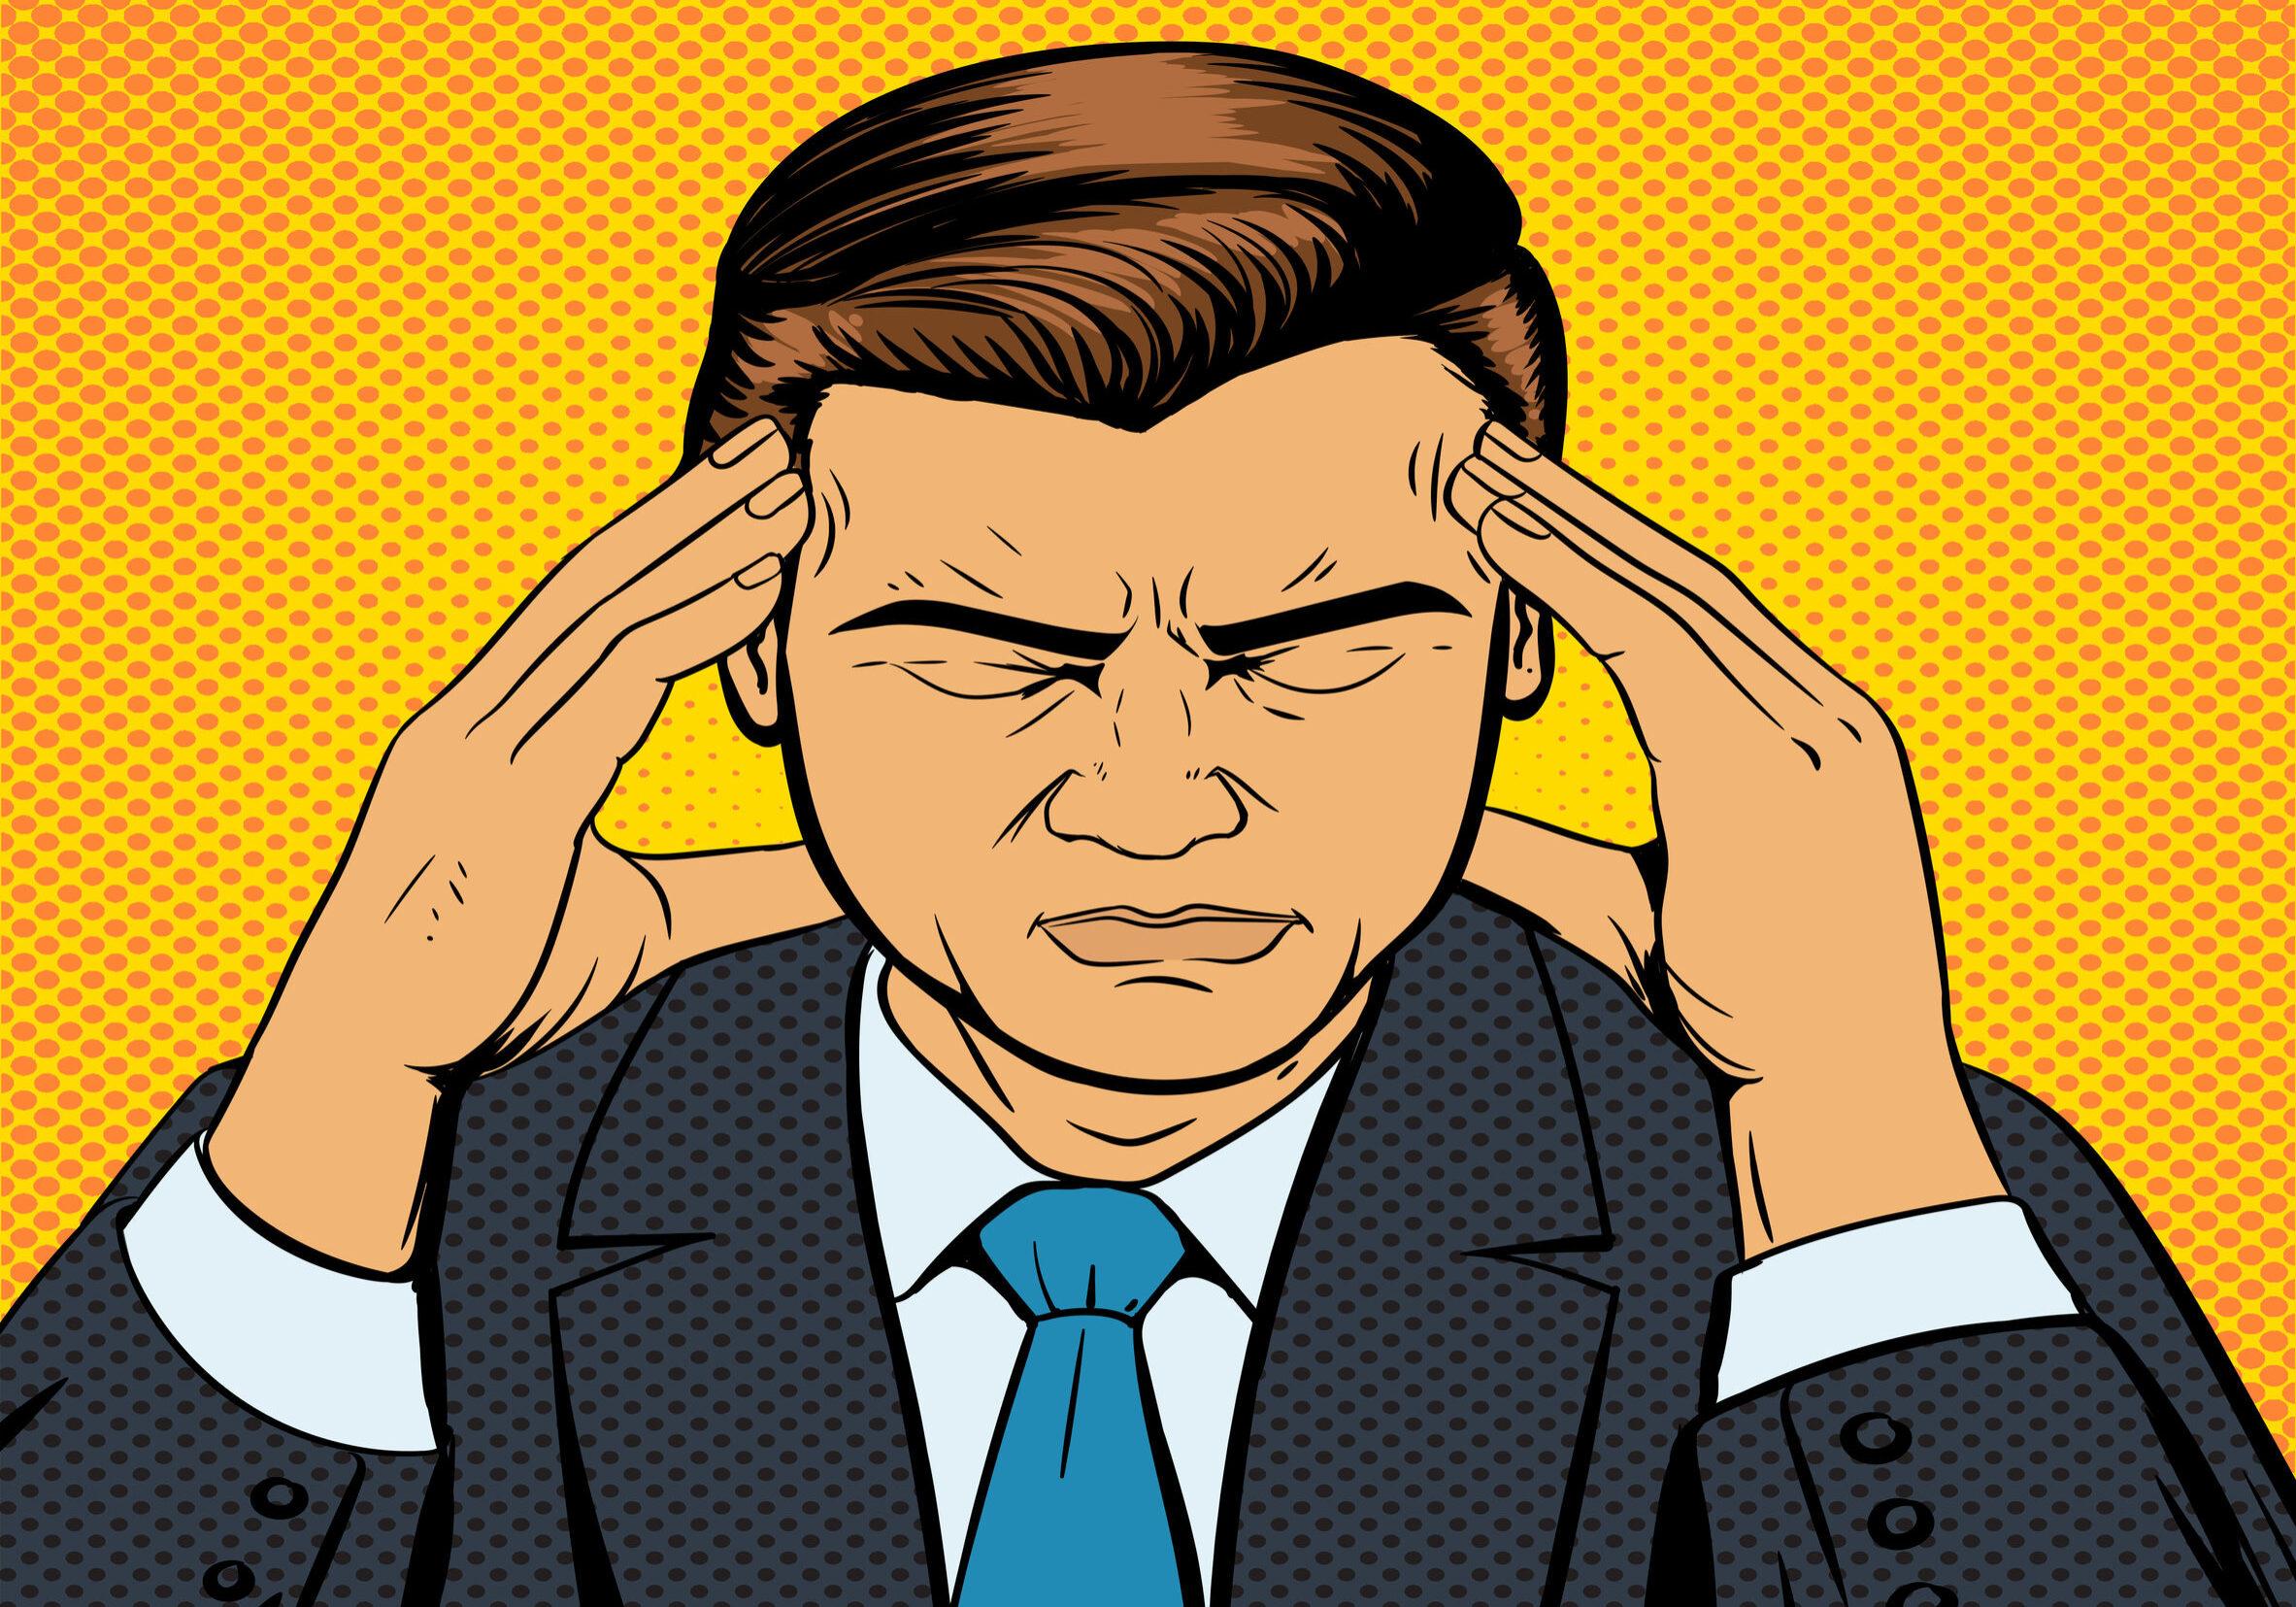 Man suffering with headache, pop art style retro vector illustration. Medical illustration. Comic book style.